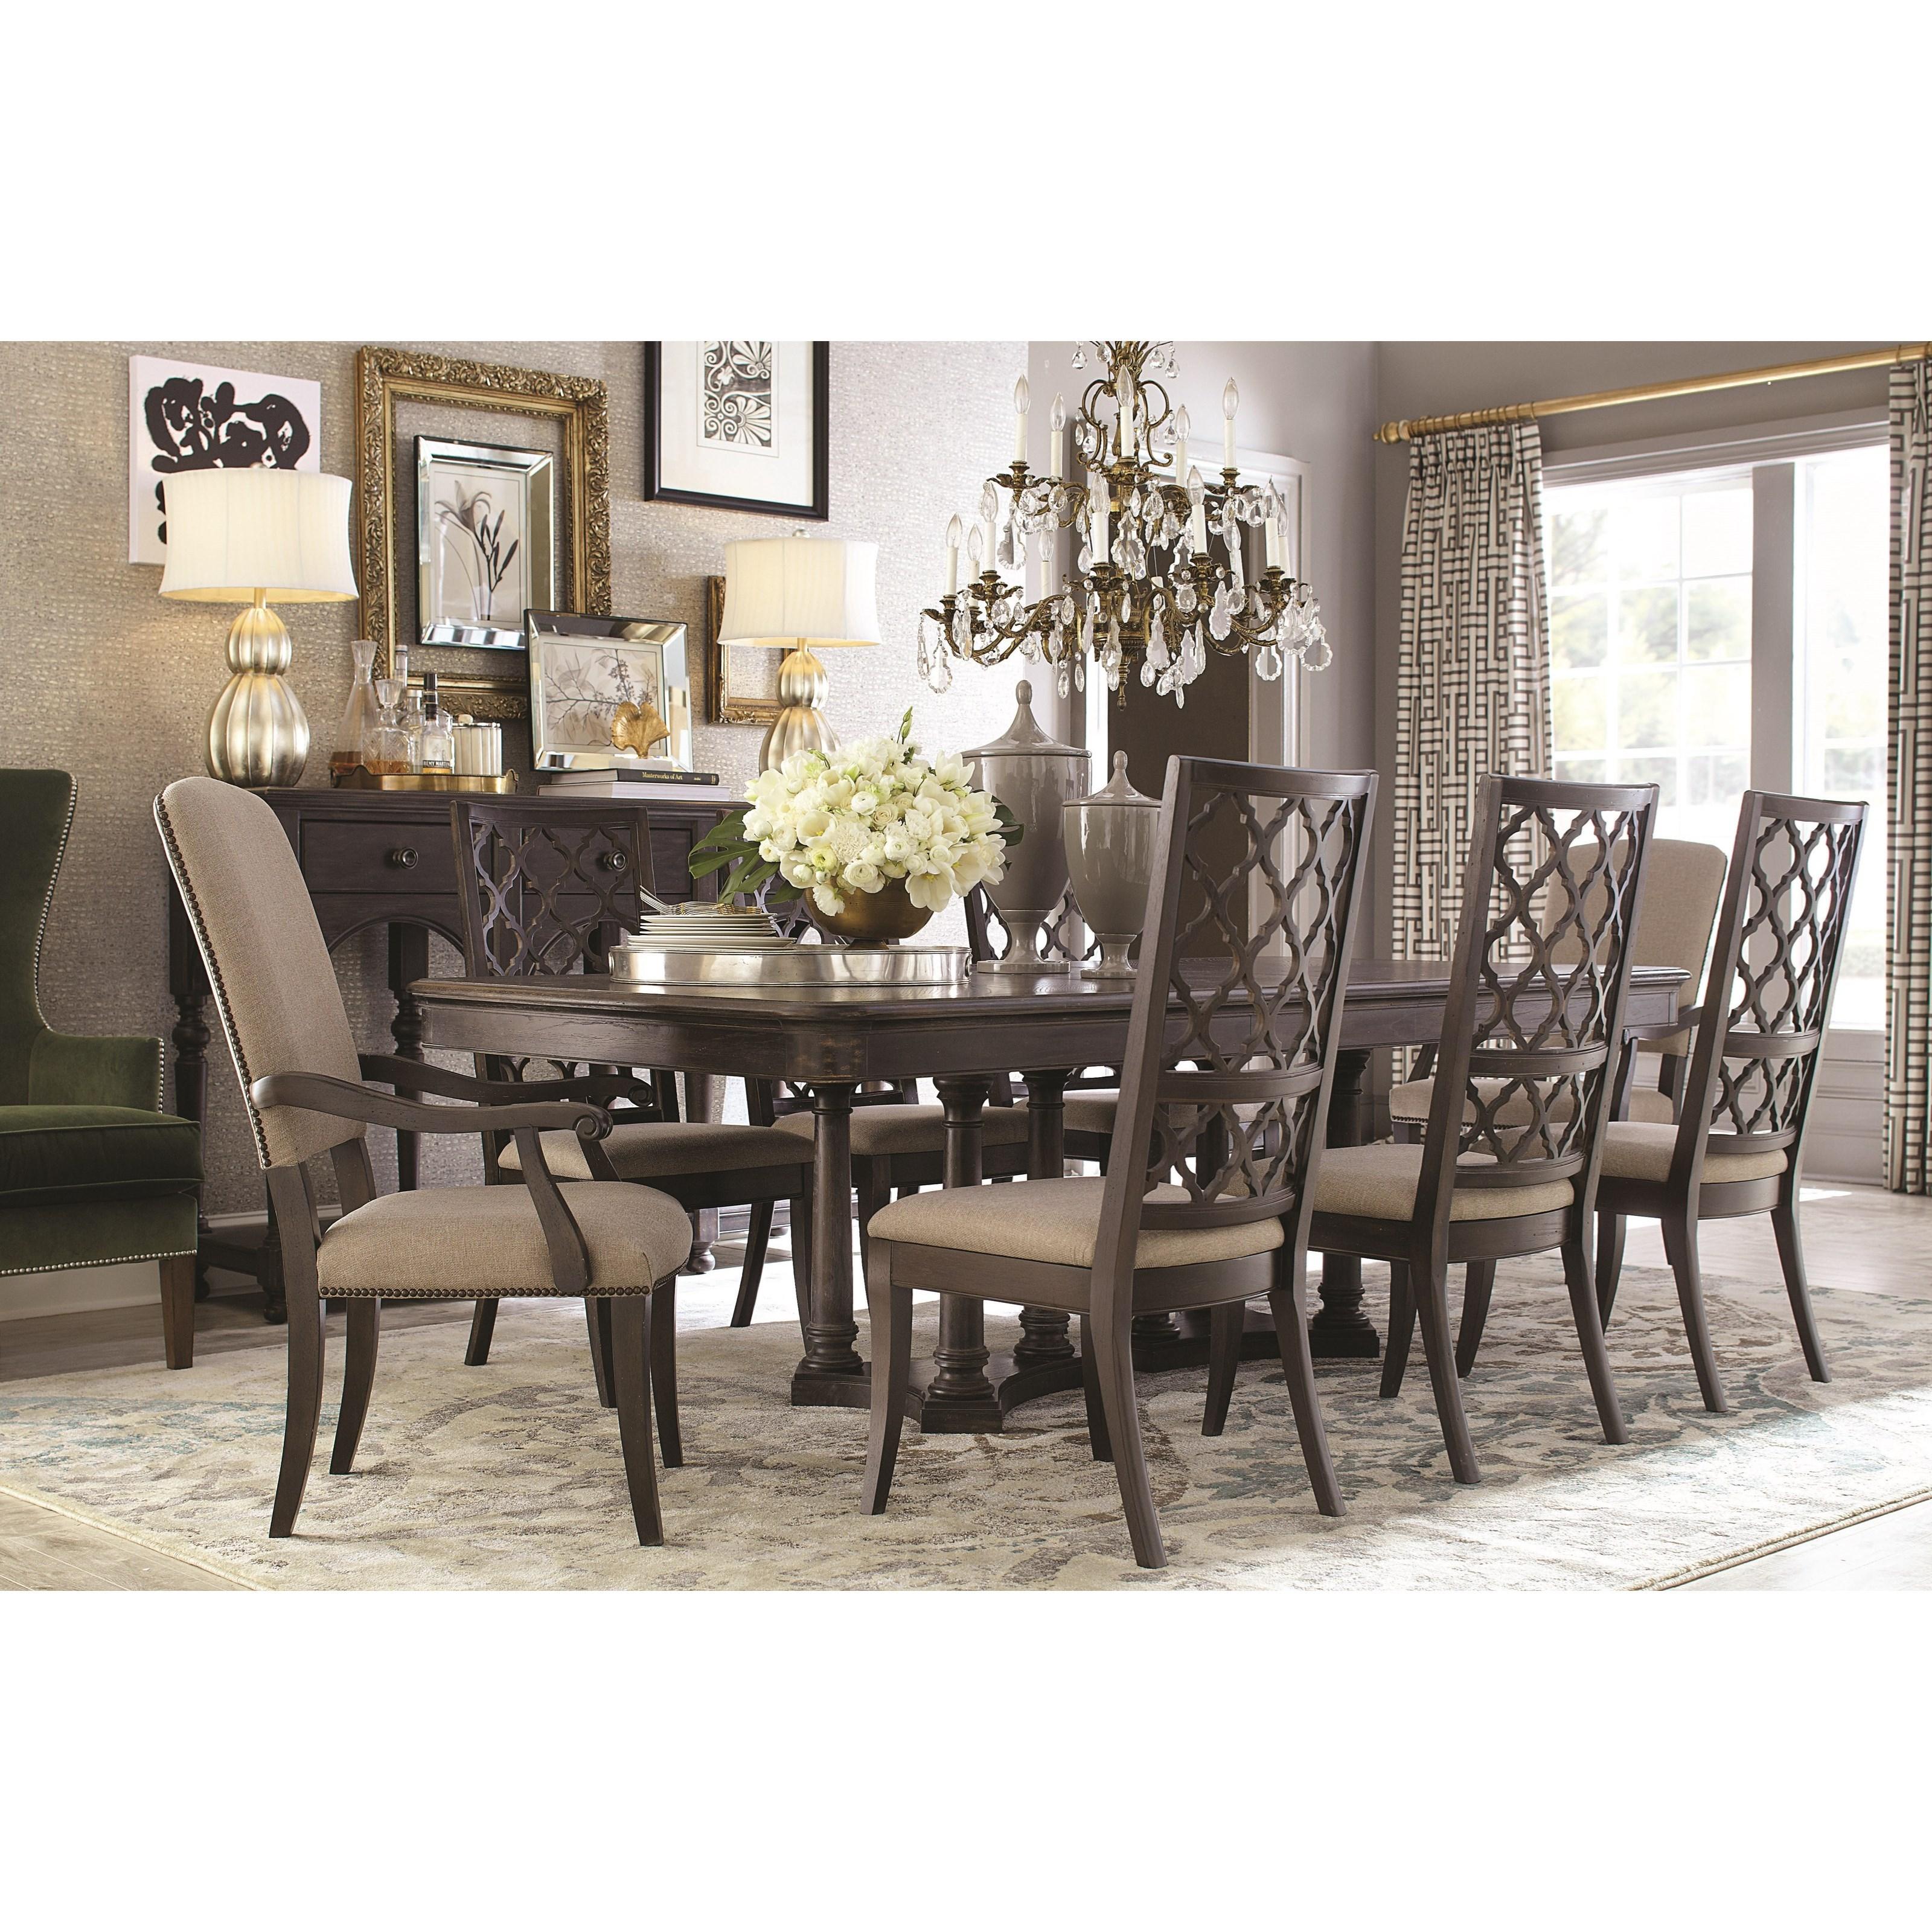 Bassett EmporiumTable And Chair Set